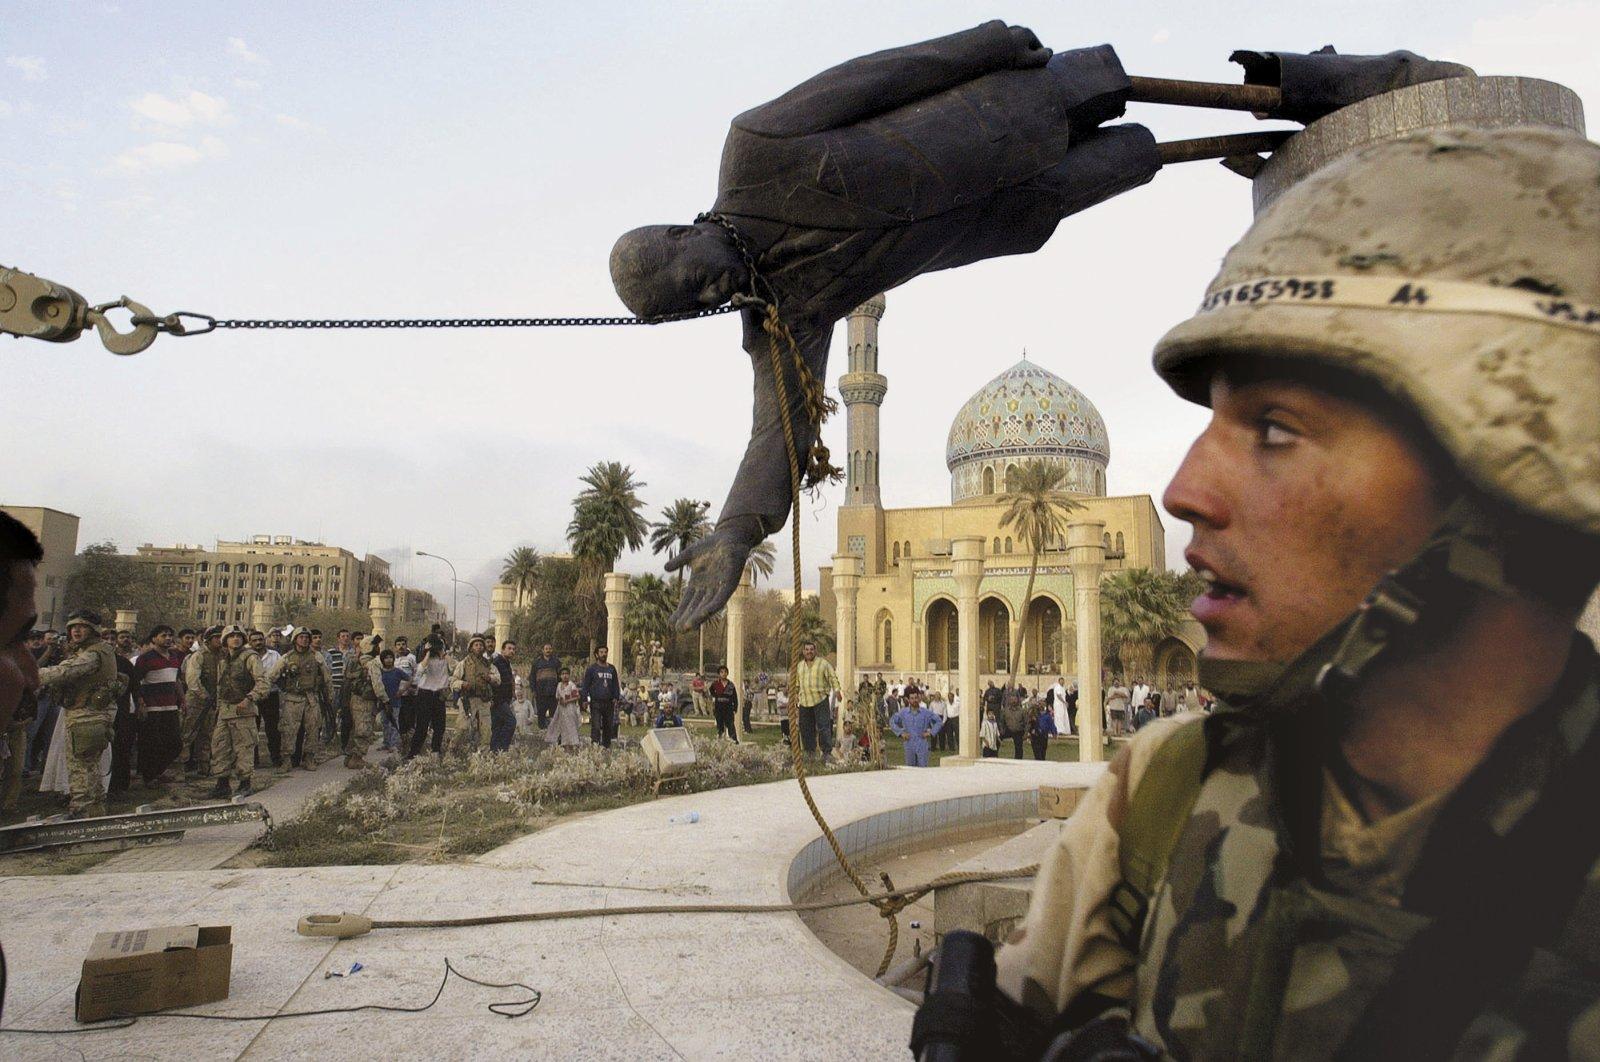 Iraqi civilians and U.S. soldiers pull down a statue of Saddam Hussein in downtown Baghdad, Iraq, April 9, 2003. (AP Photo)